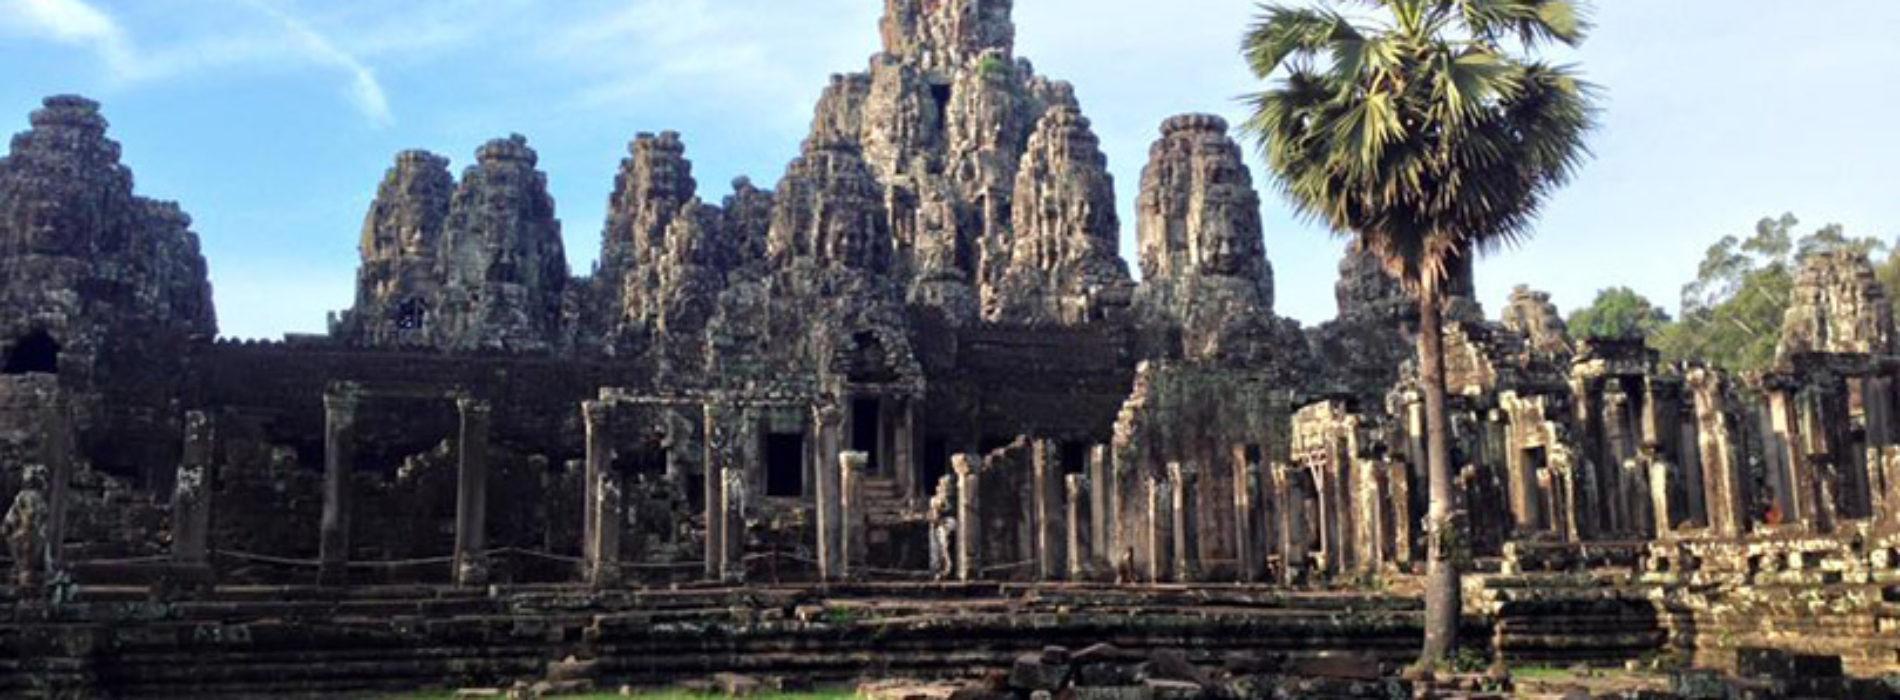 5 fun facts sur le Cambodge